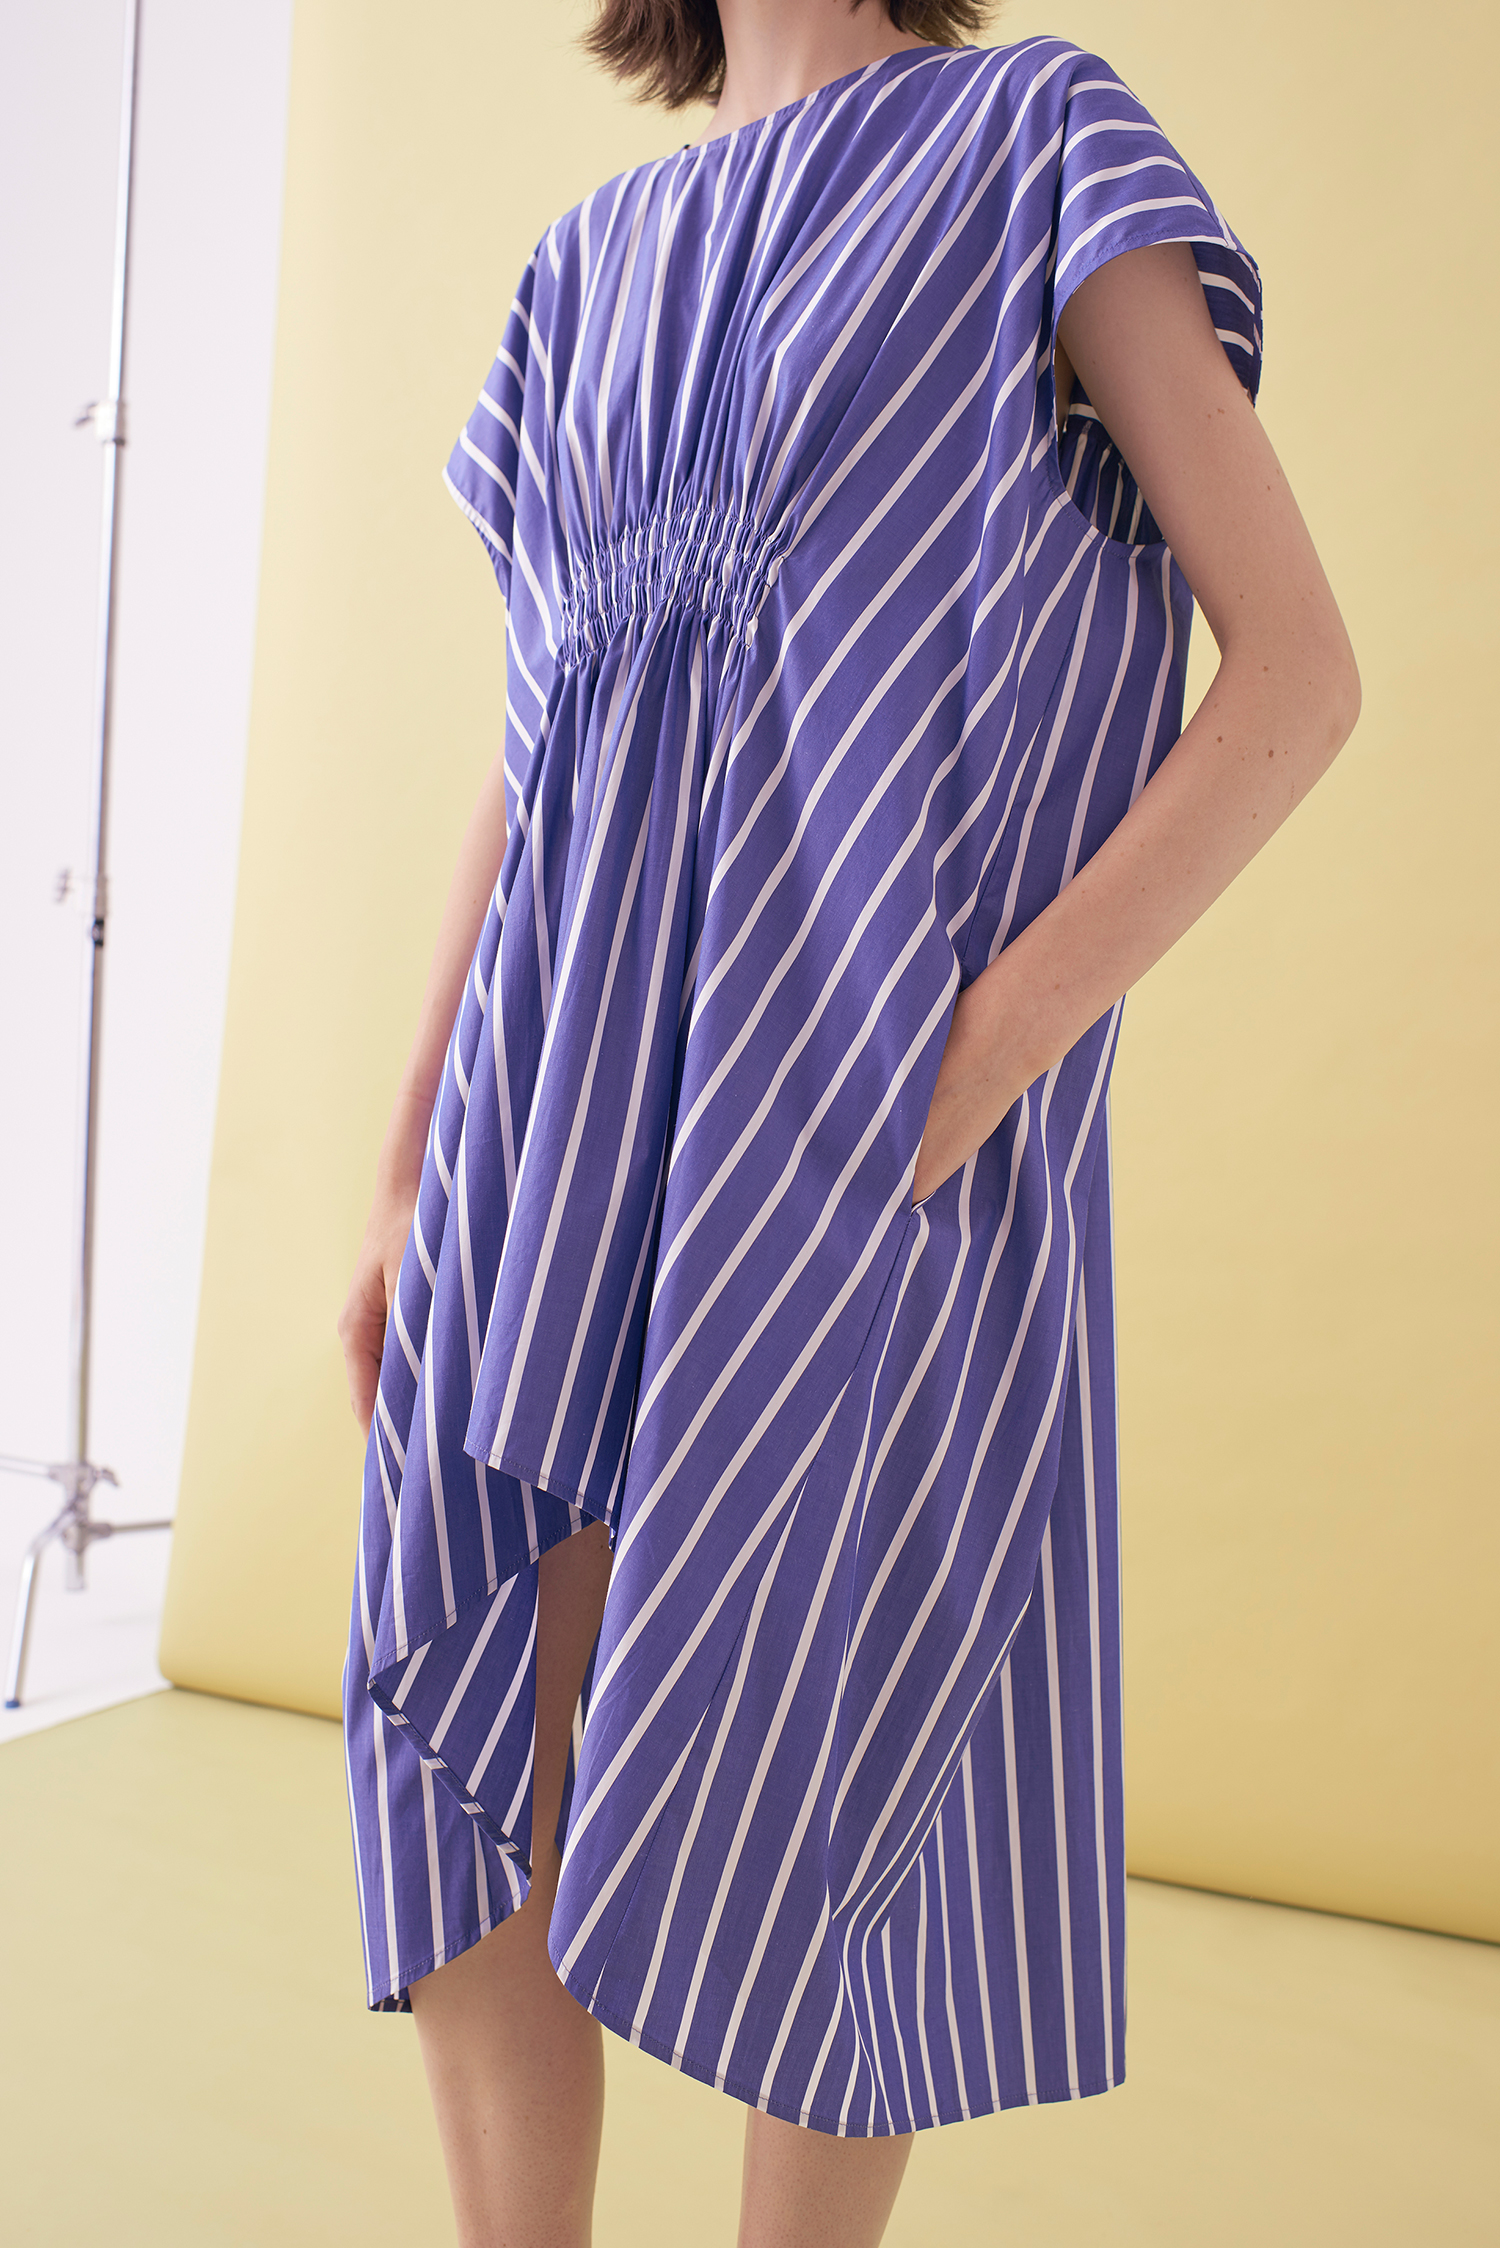 Sarah_Swann_SS17_01_Striped_Shirring_Dress_CeruleanBlue_D02.jpg